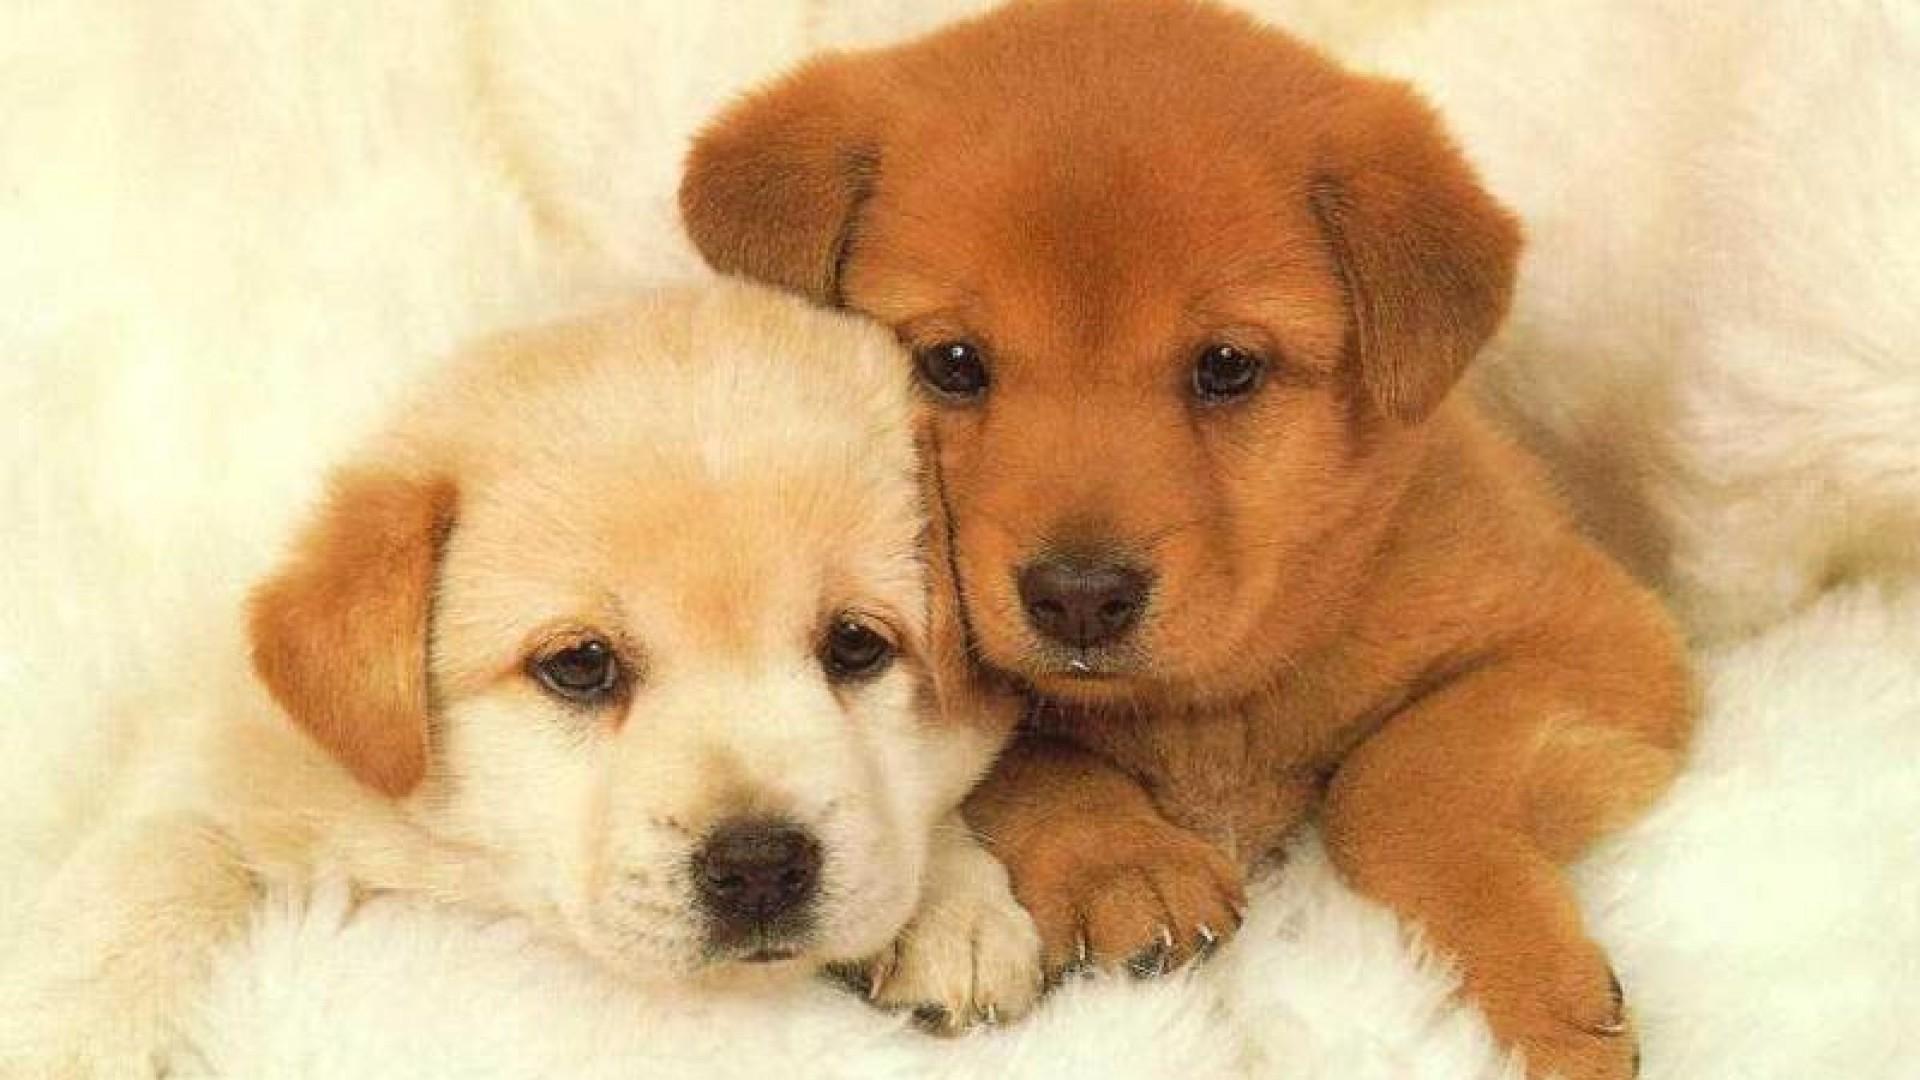 HD Puppy Wallpaper · Download · 1920x1200